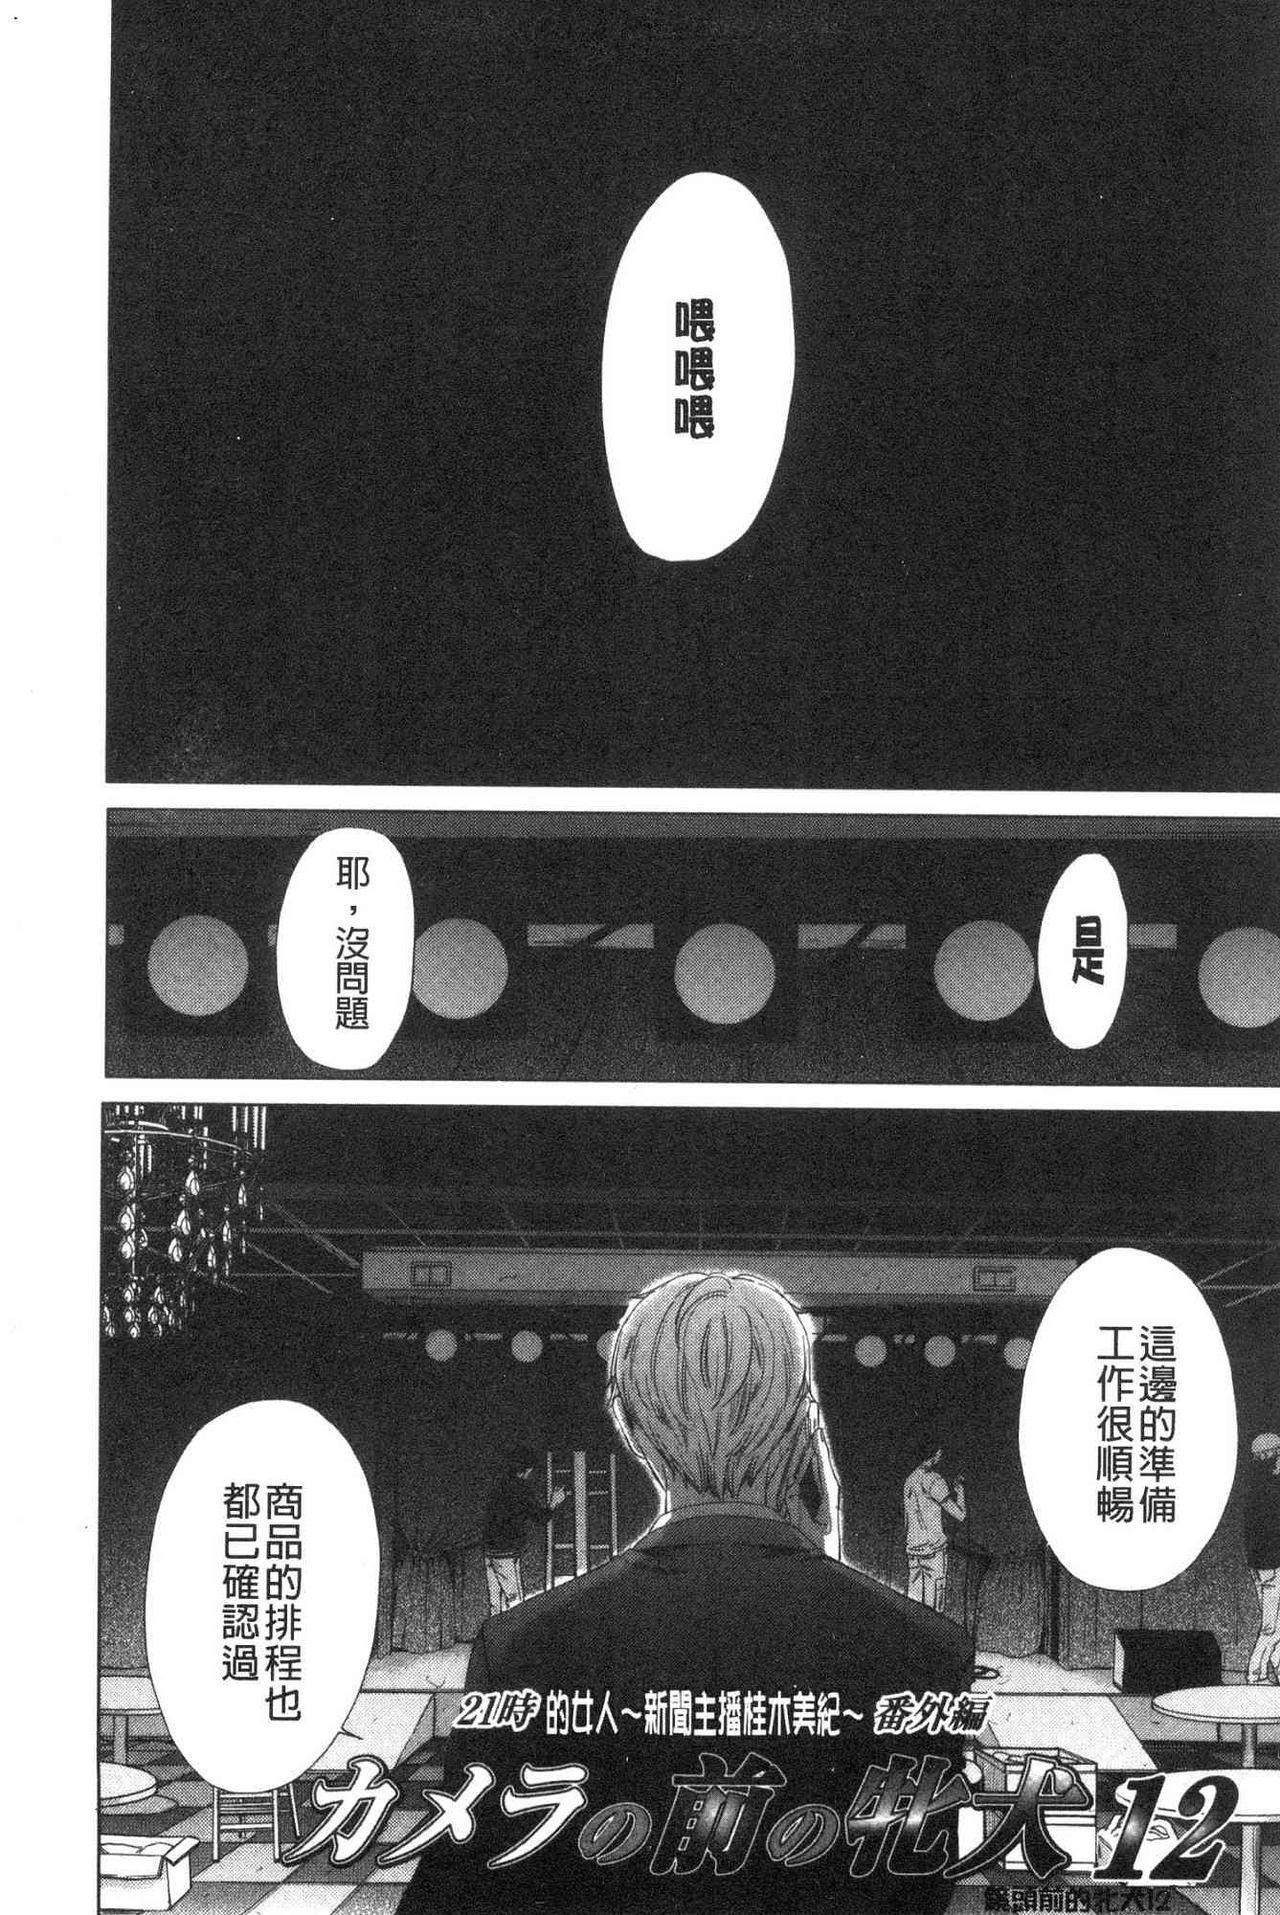 [Gotoh Akira]  21-ji no Onna ~Camera no Mae no Mesuinu~ 2 | 21時之女 ~鏡頭前的牝犬~ 2 [Chinese] 138